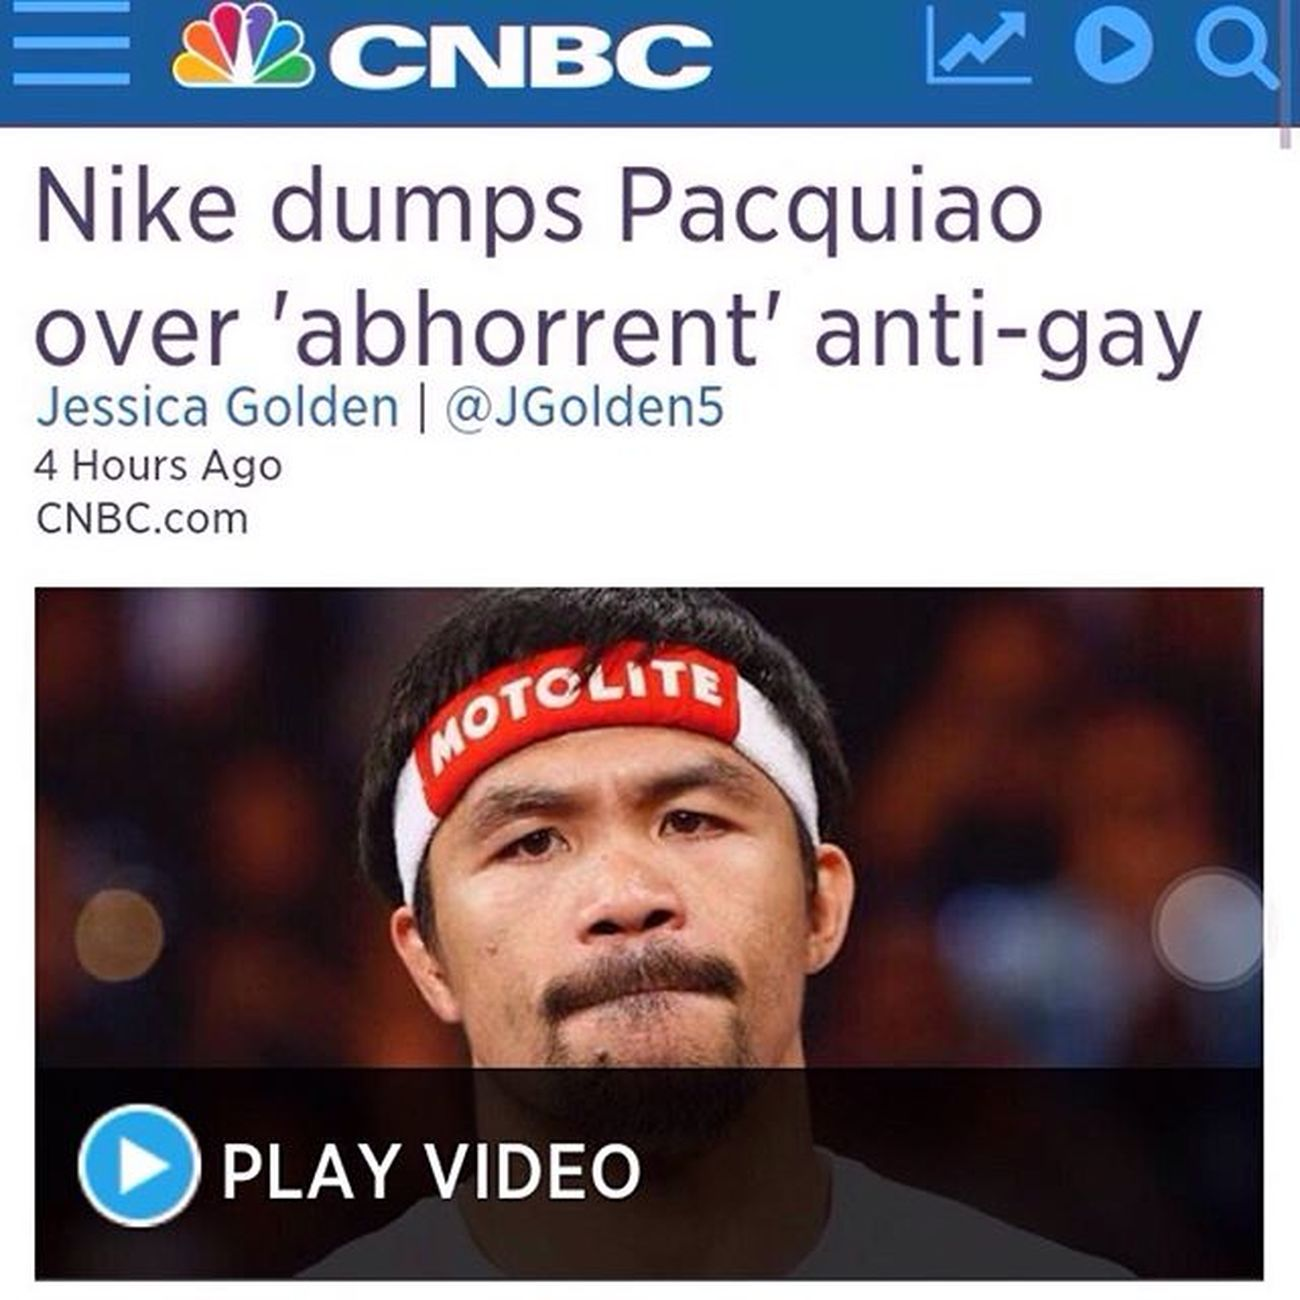 I think I'ma buy myself a new pair of Nikes... Love you Nike! GenderEquality NikeforLife 😊